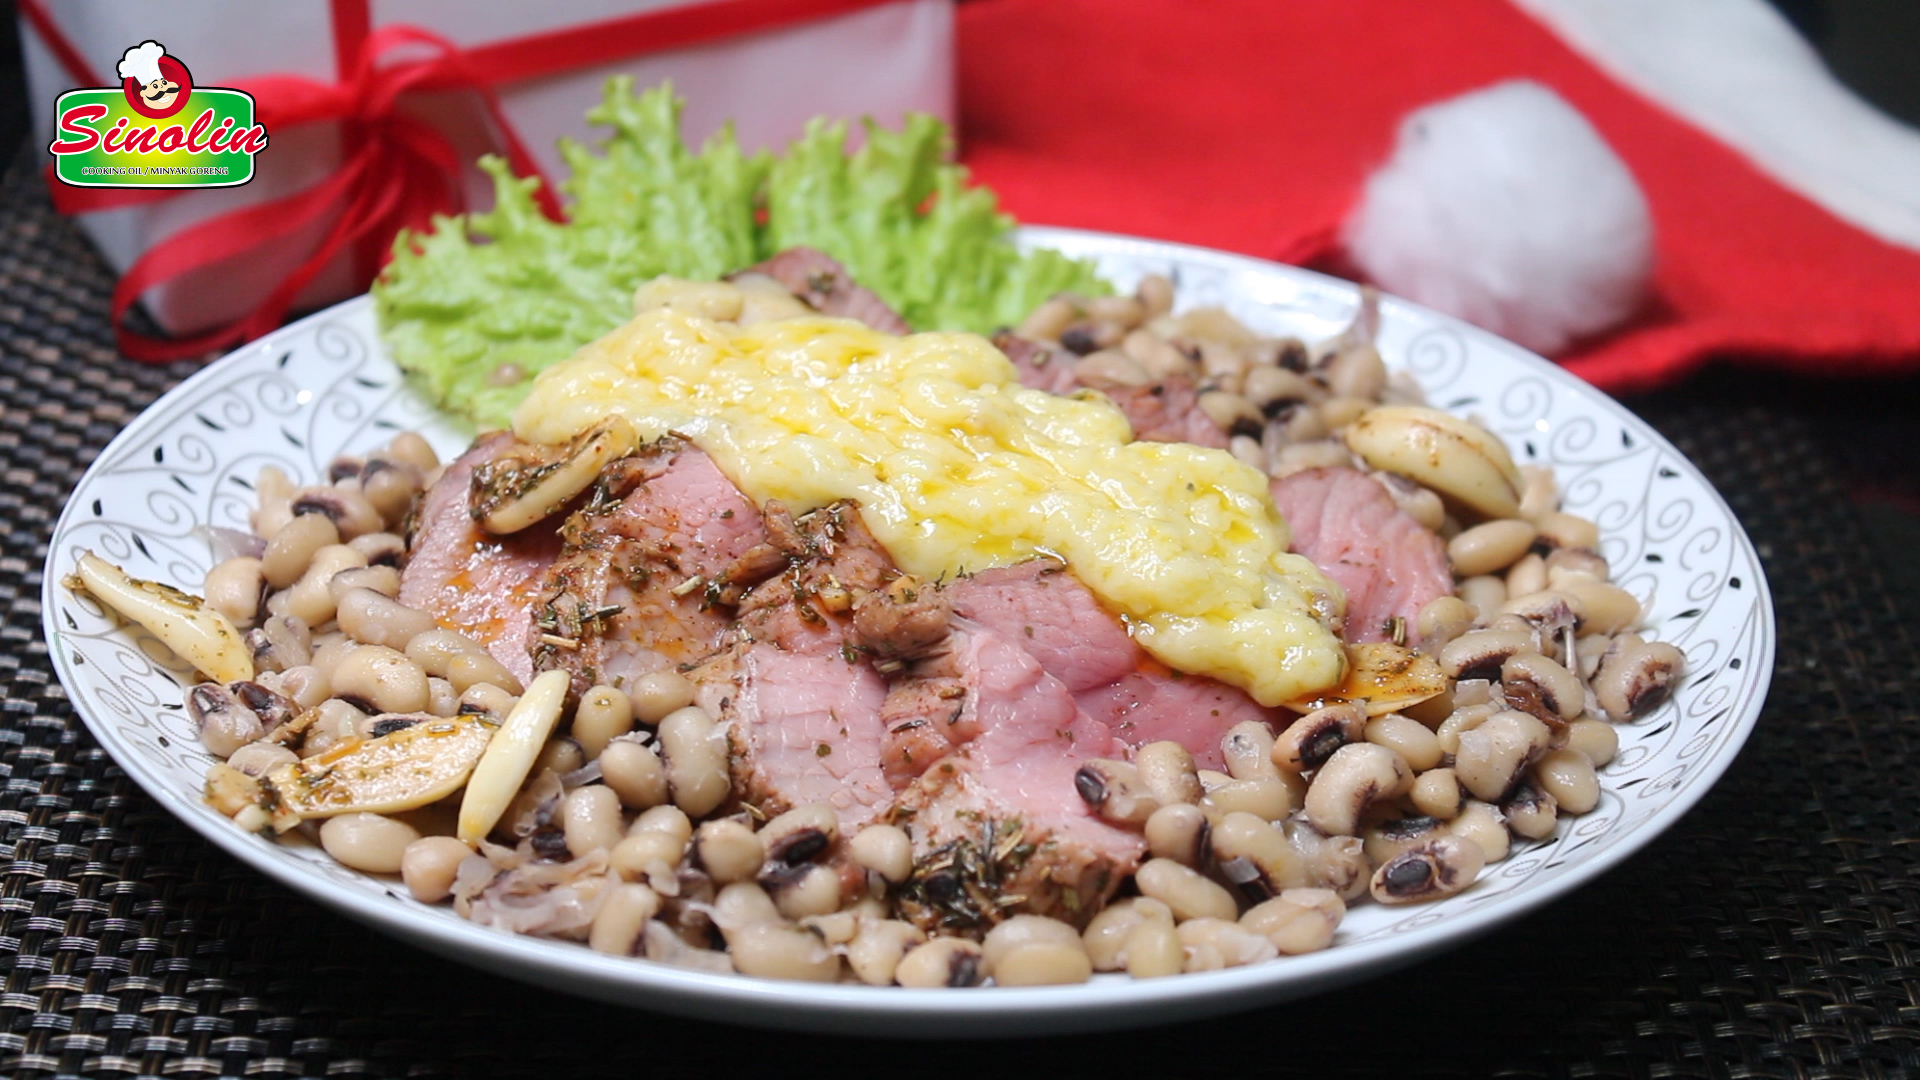 Rosemary Garlic Beef Roast by Dapur Sinolin